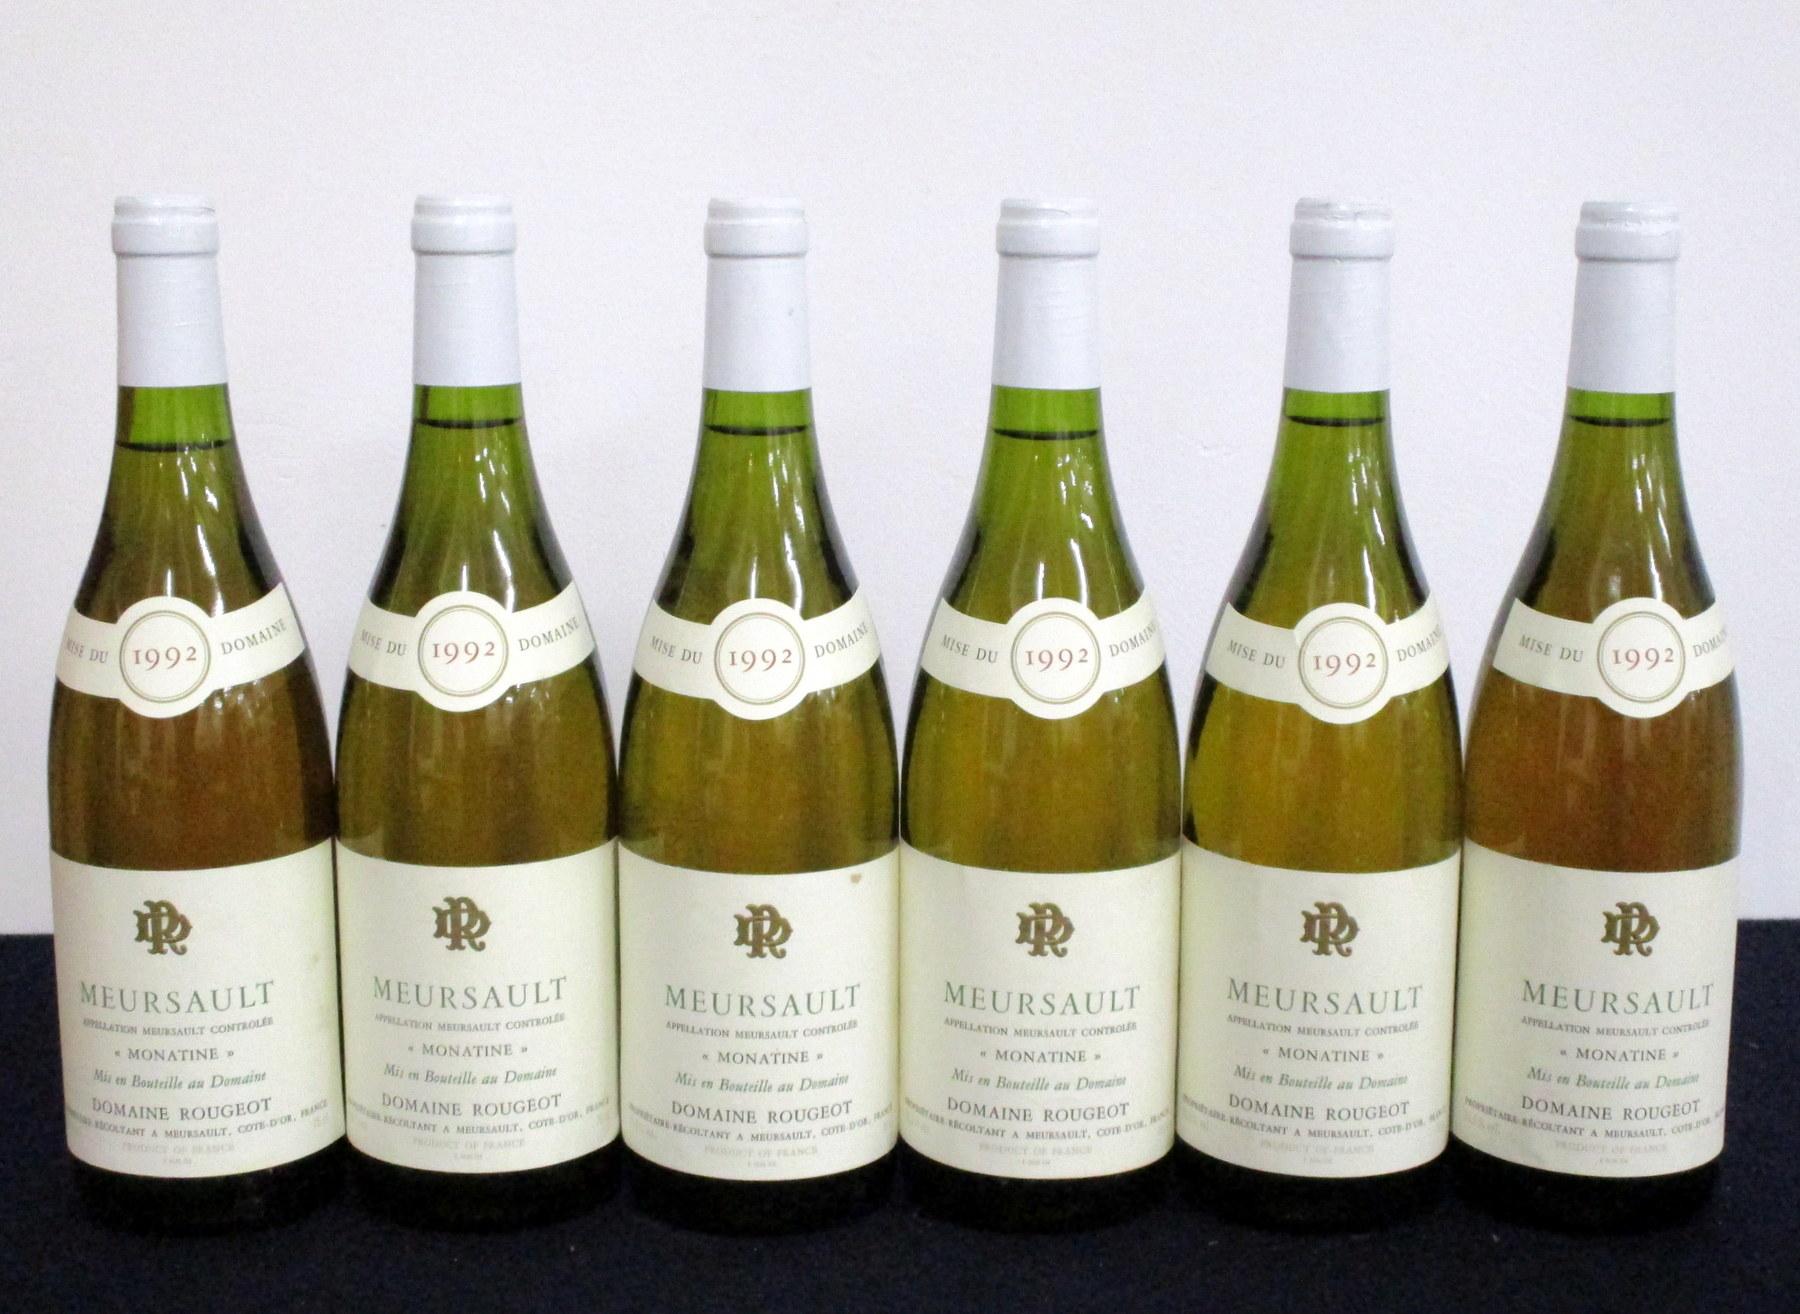 6 bts Meursault 'Monatine' 1992 Dom Rougeot 5 i.n, 1 vts